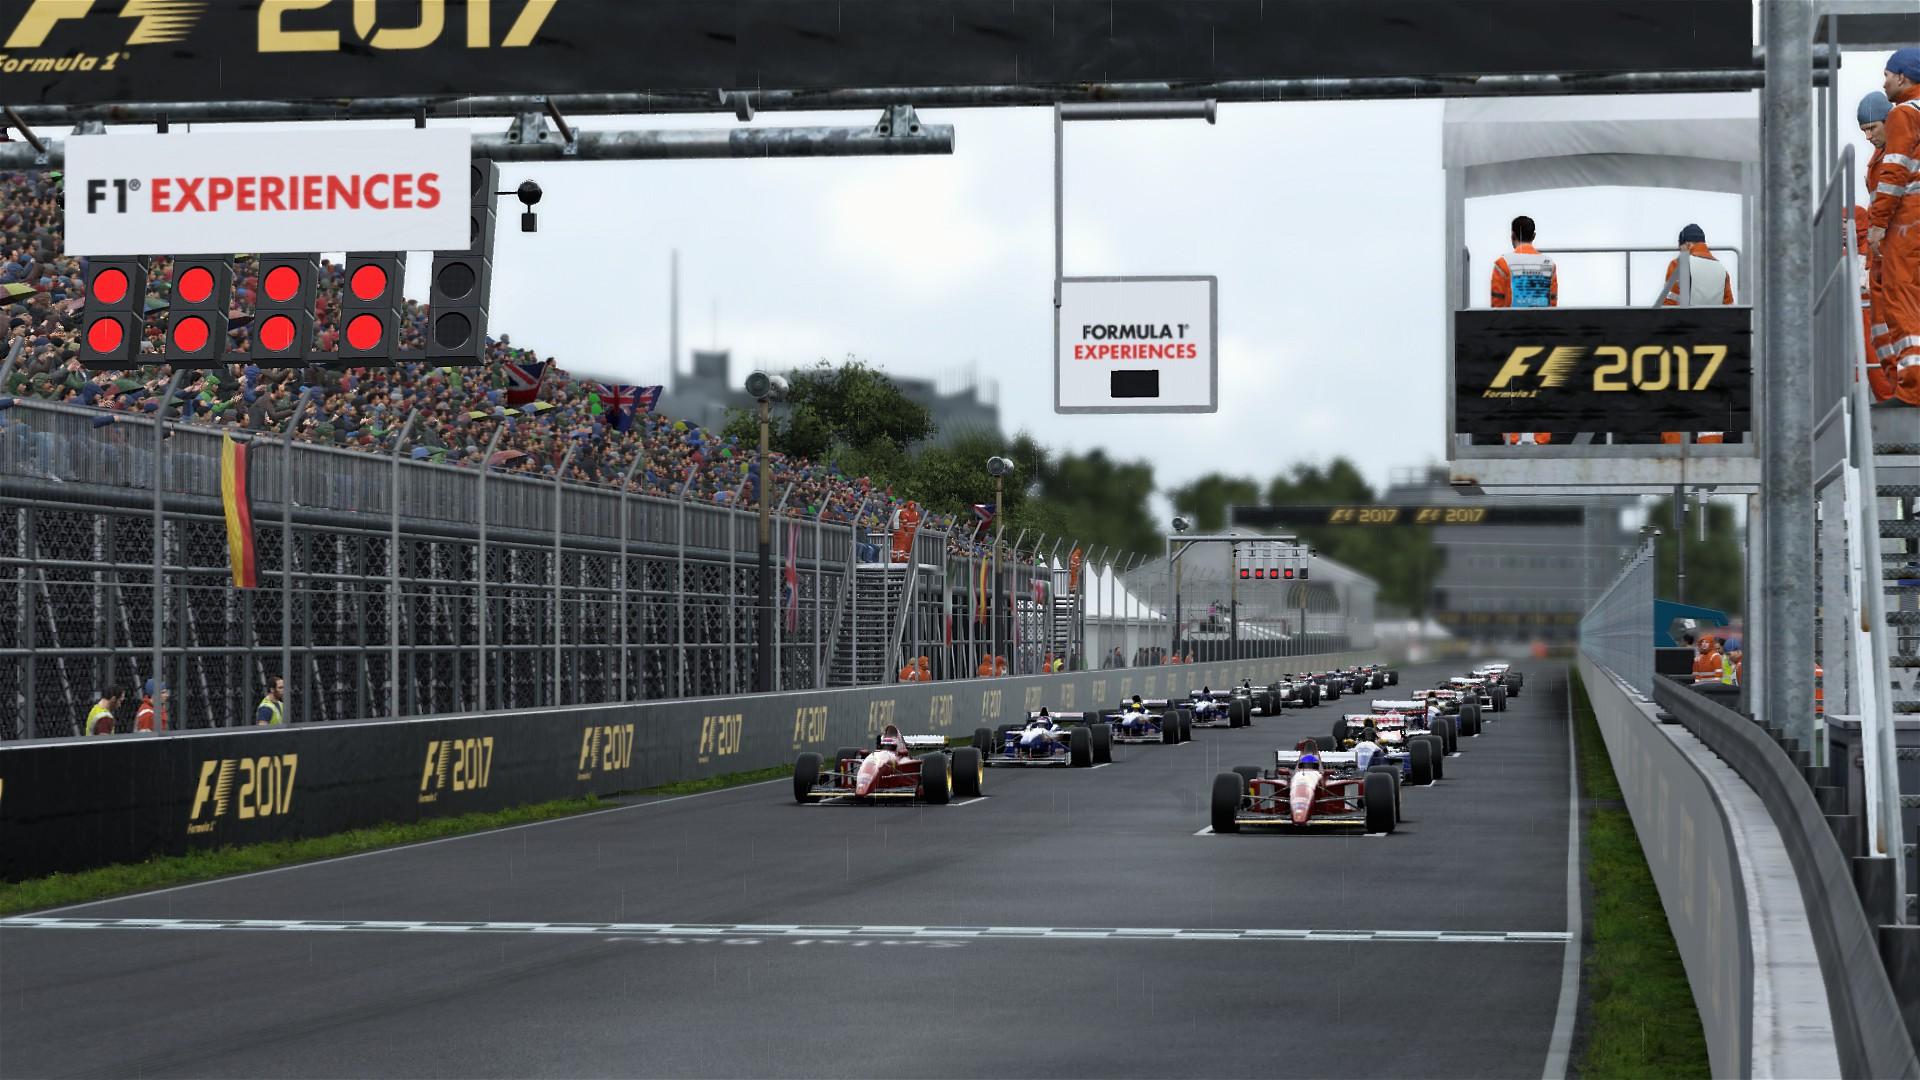 F1 2017 Live Stream.jpg